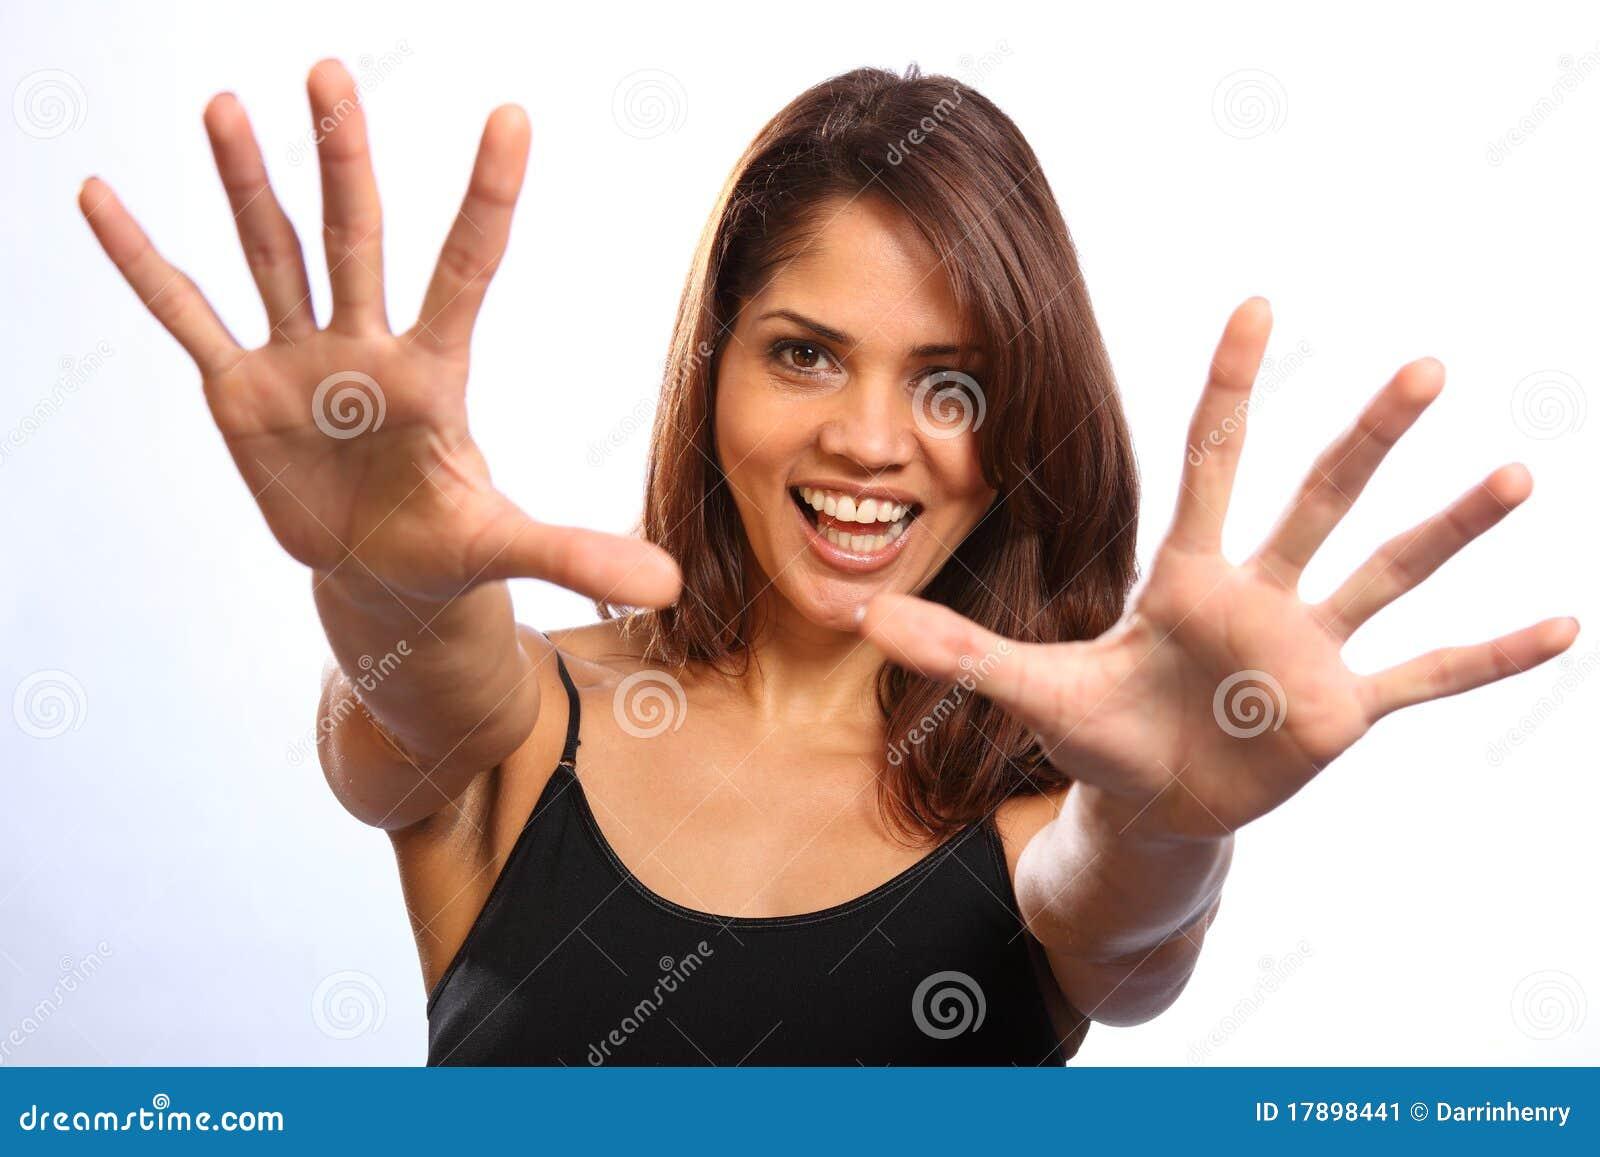 beautiful-happy-young-woman-reaching-out